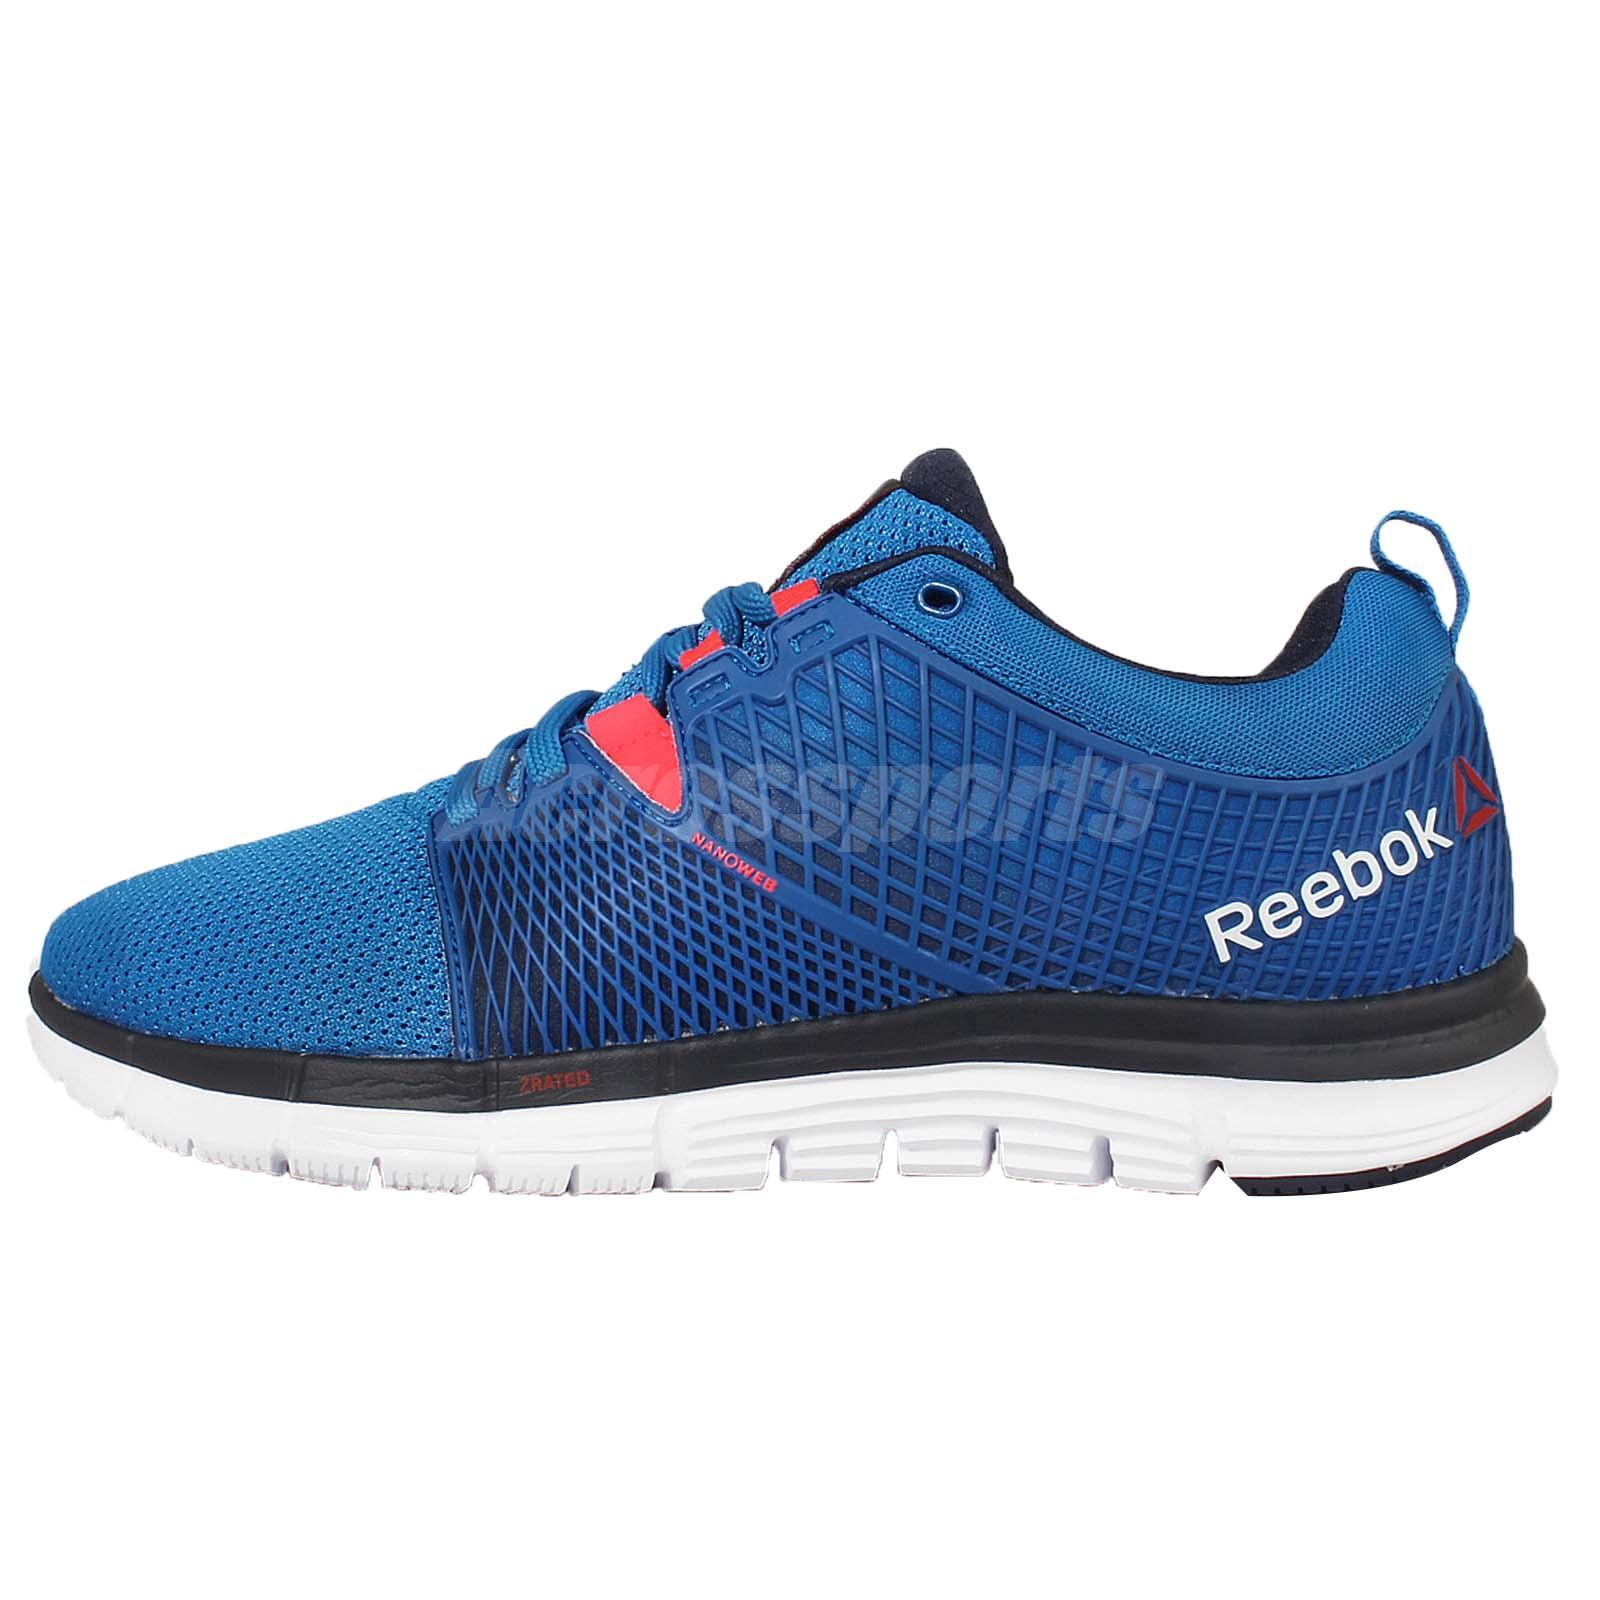 ... Womens Running Shoes Reebok Zig Reebok Zquick Dash Mens Running Shoes  Sneakers Trainers Runner Pick 1  c4e39b50e